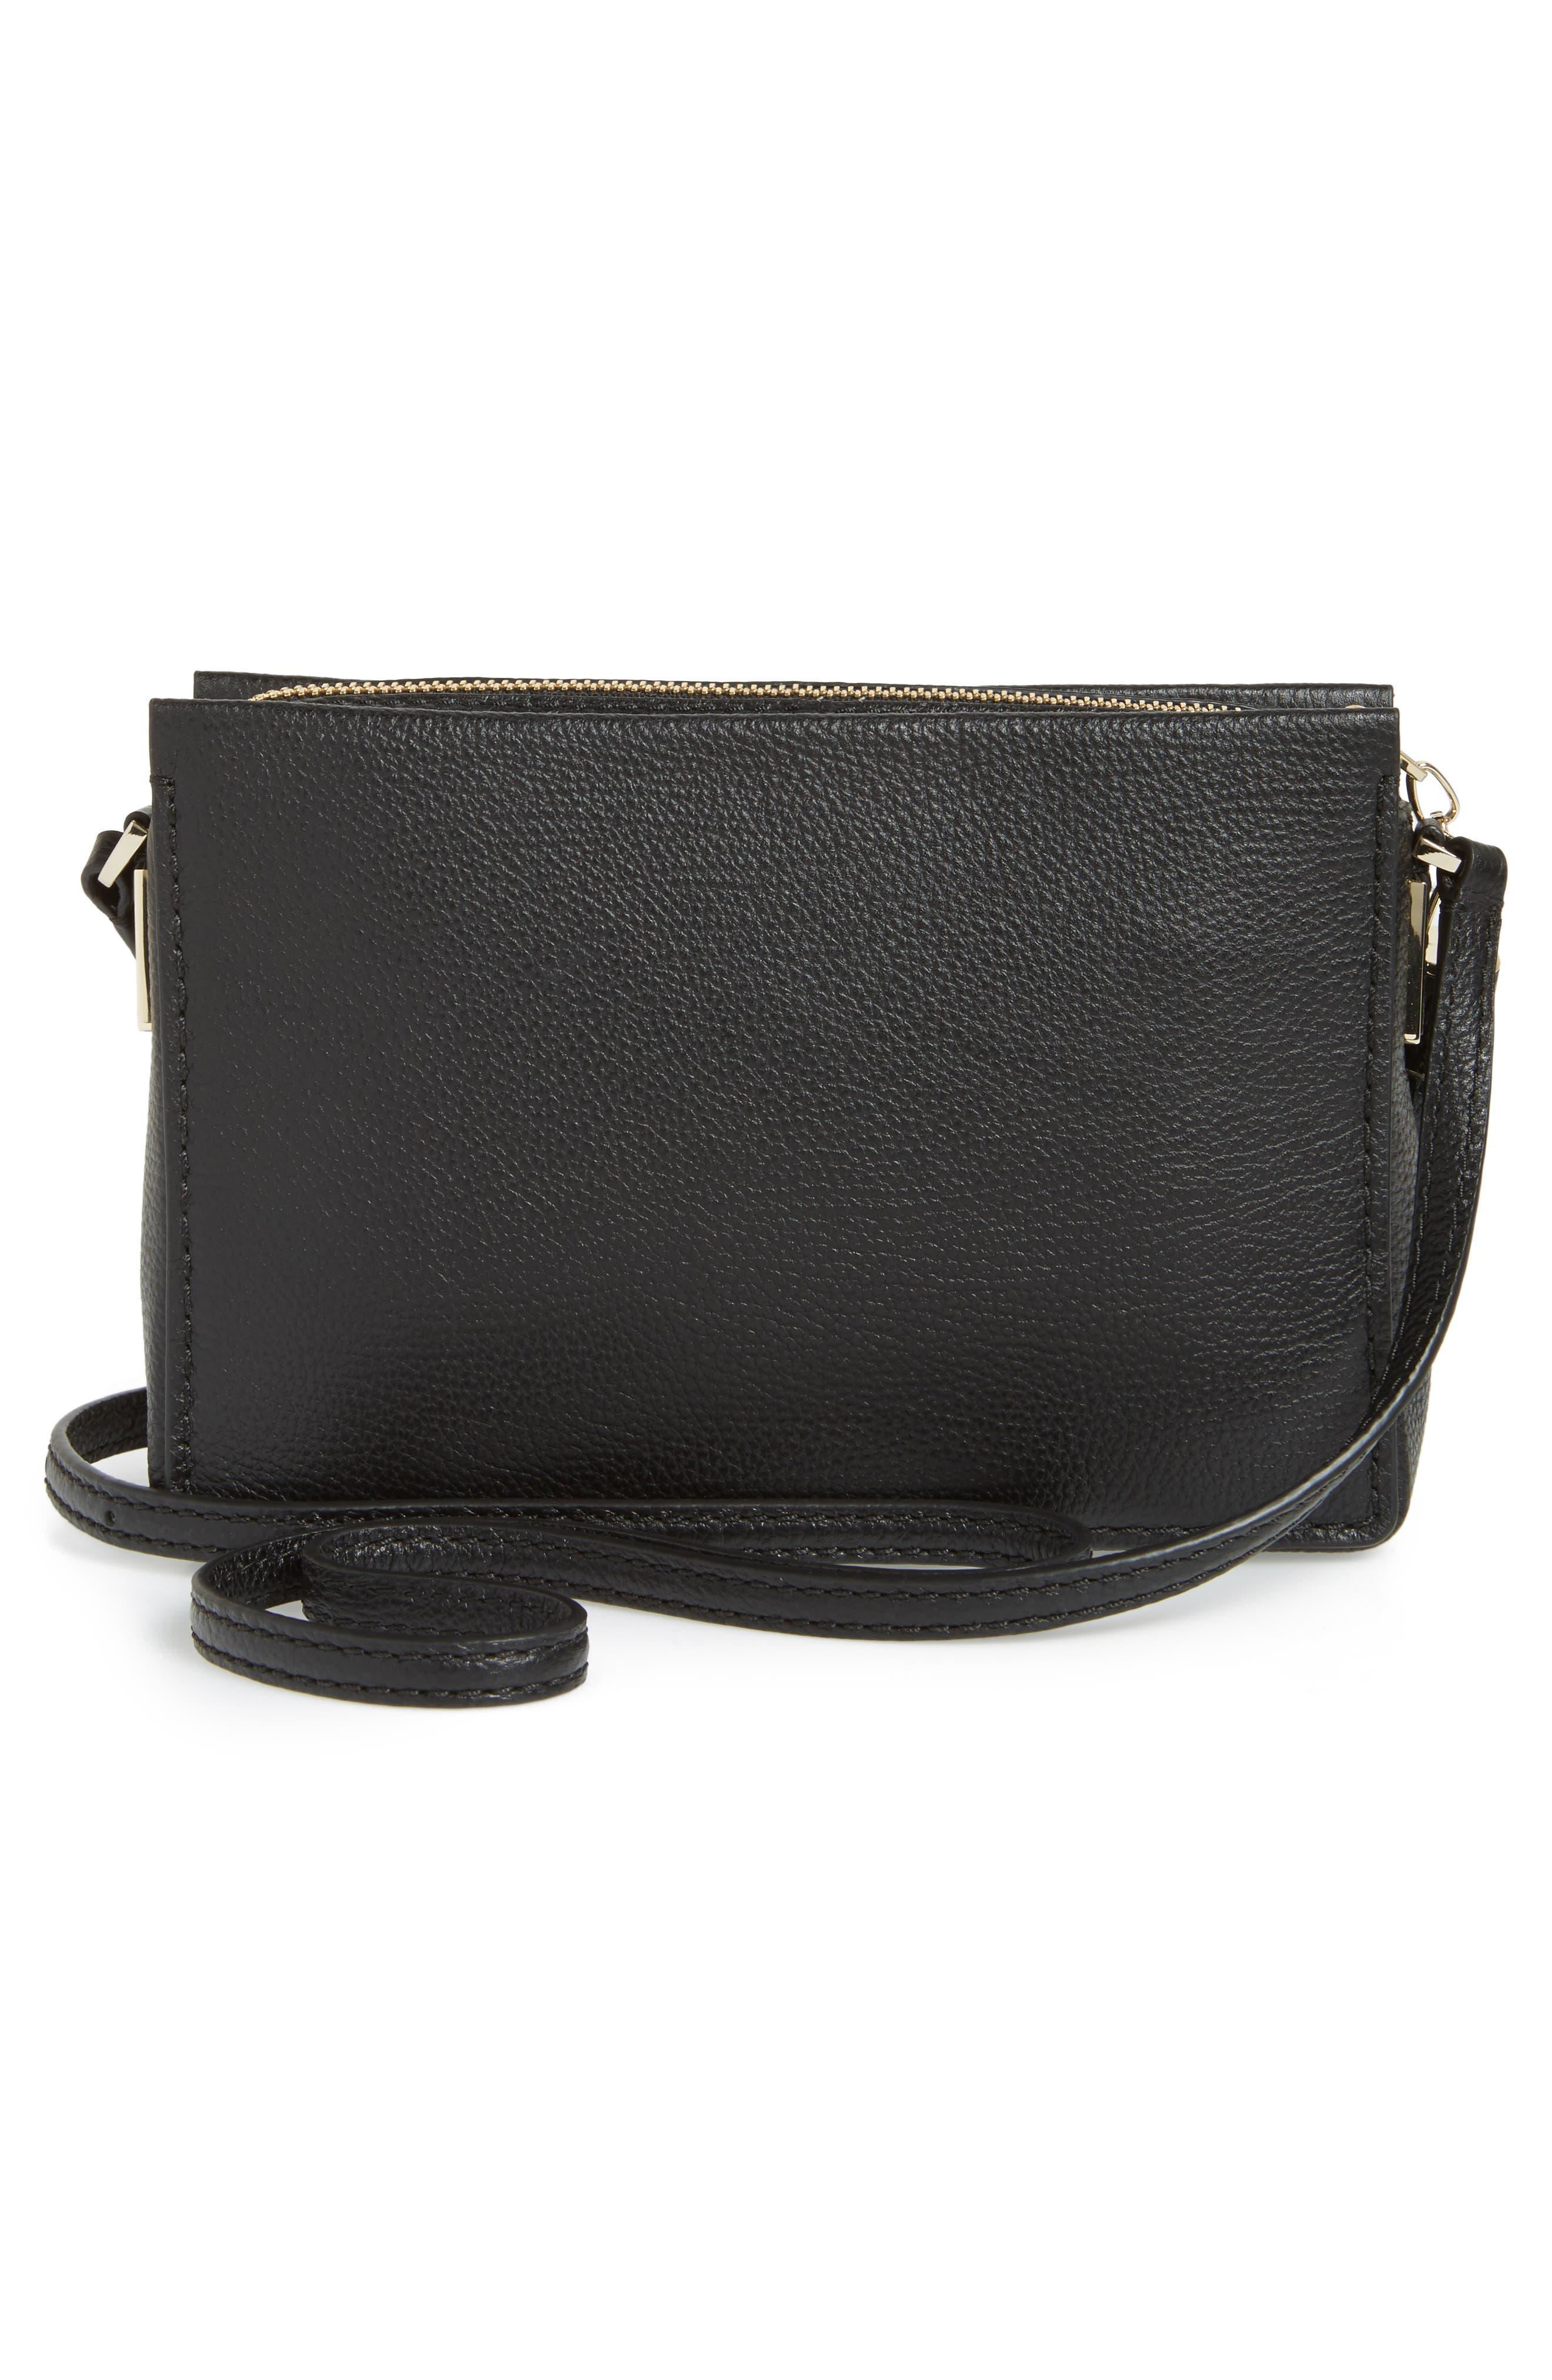 kingston drive - gillian leather crossbody bag,                             Alternate thumbnail 3, color,                             001